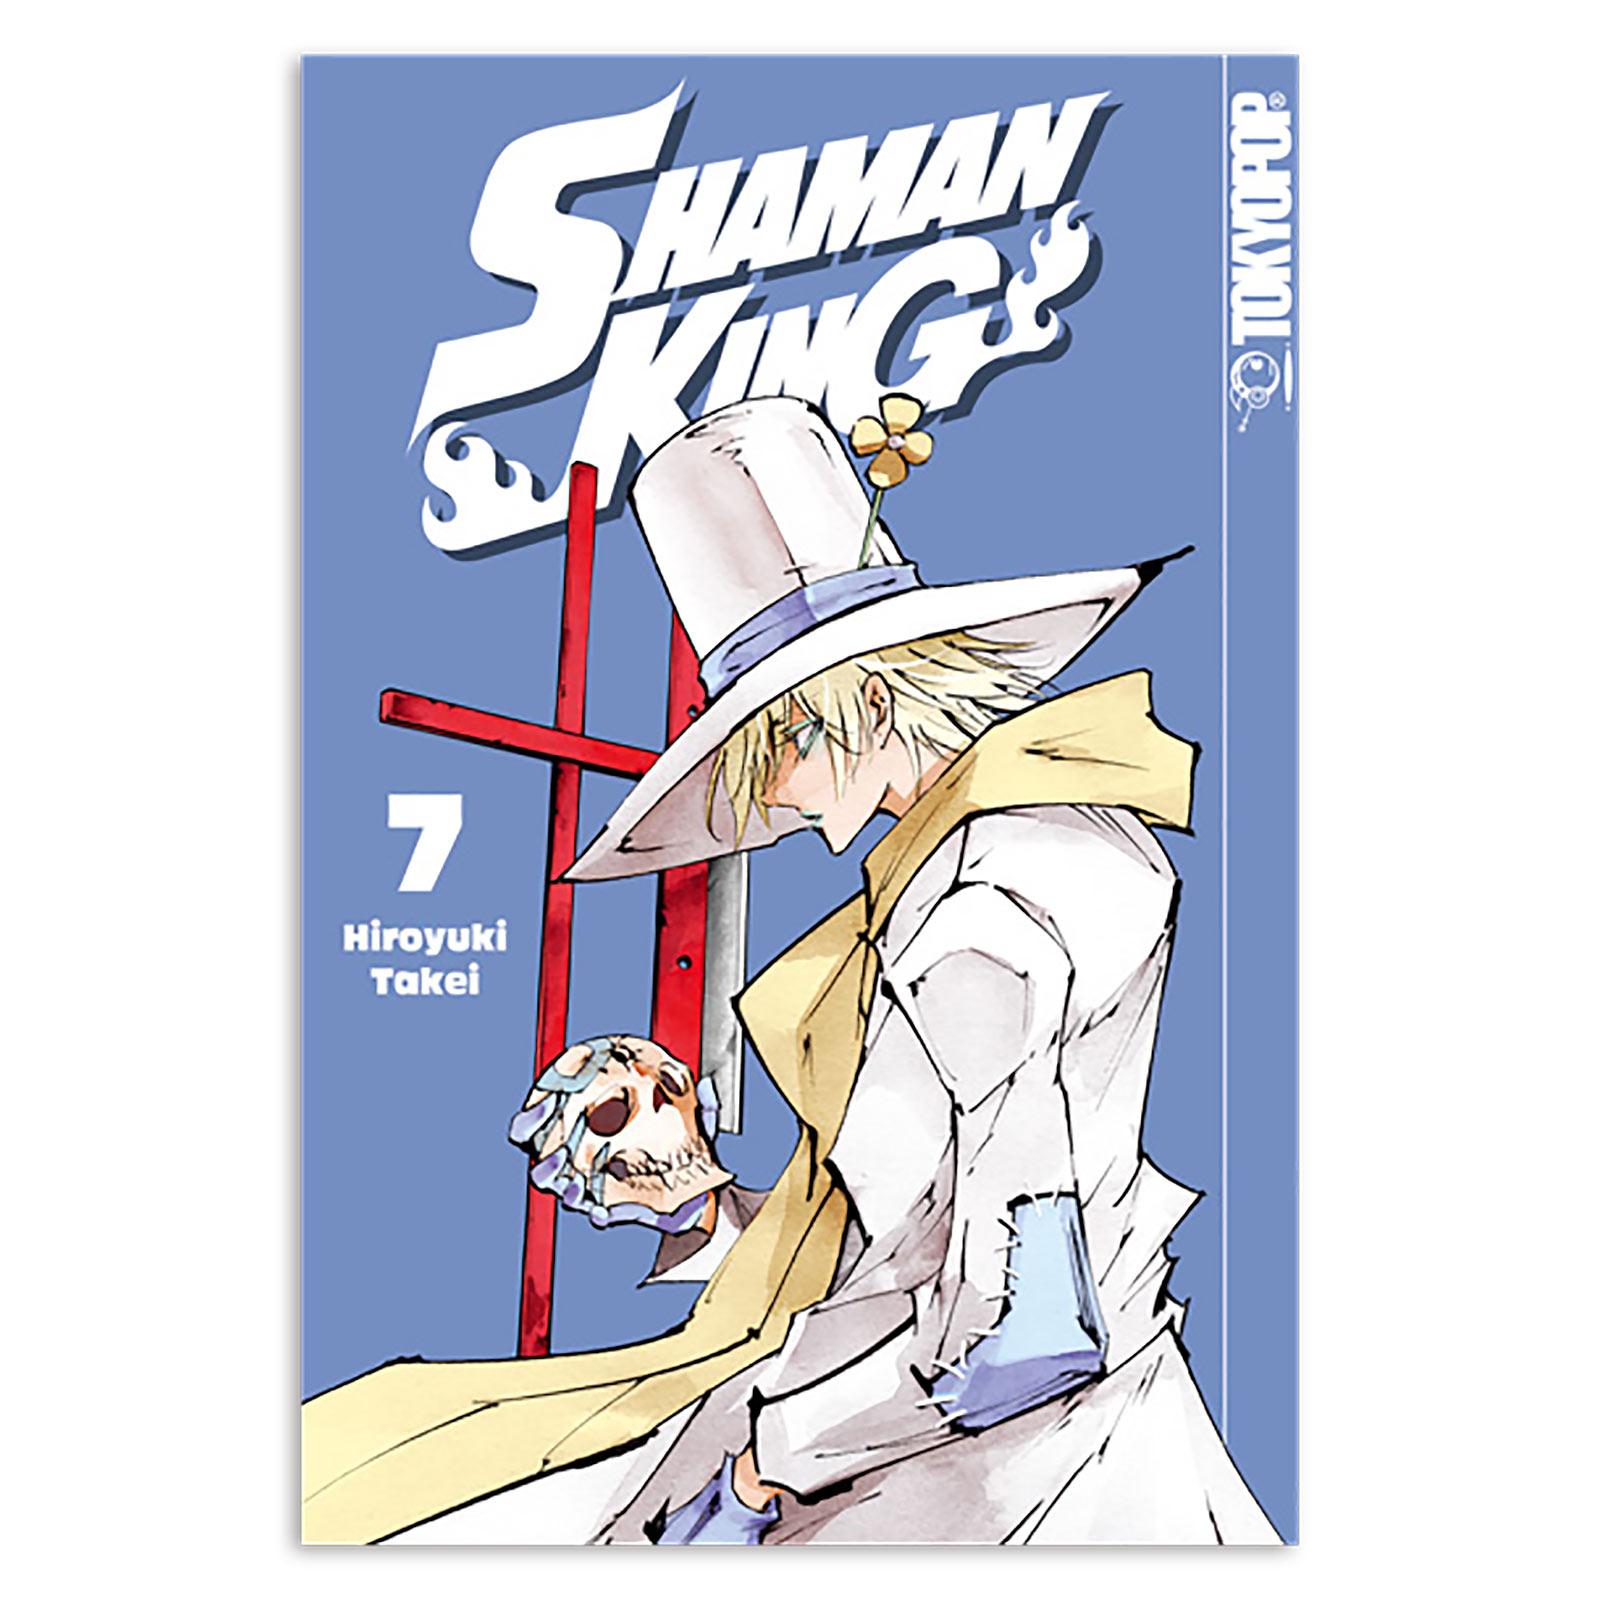 Shaman King - Band 7 Taschenbuch